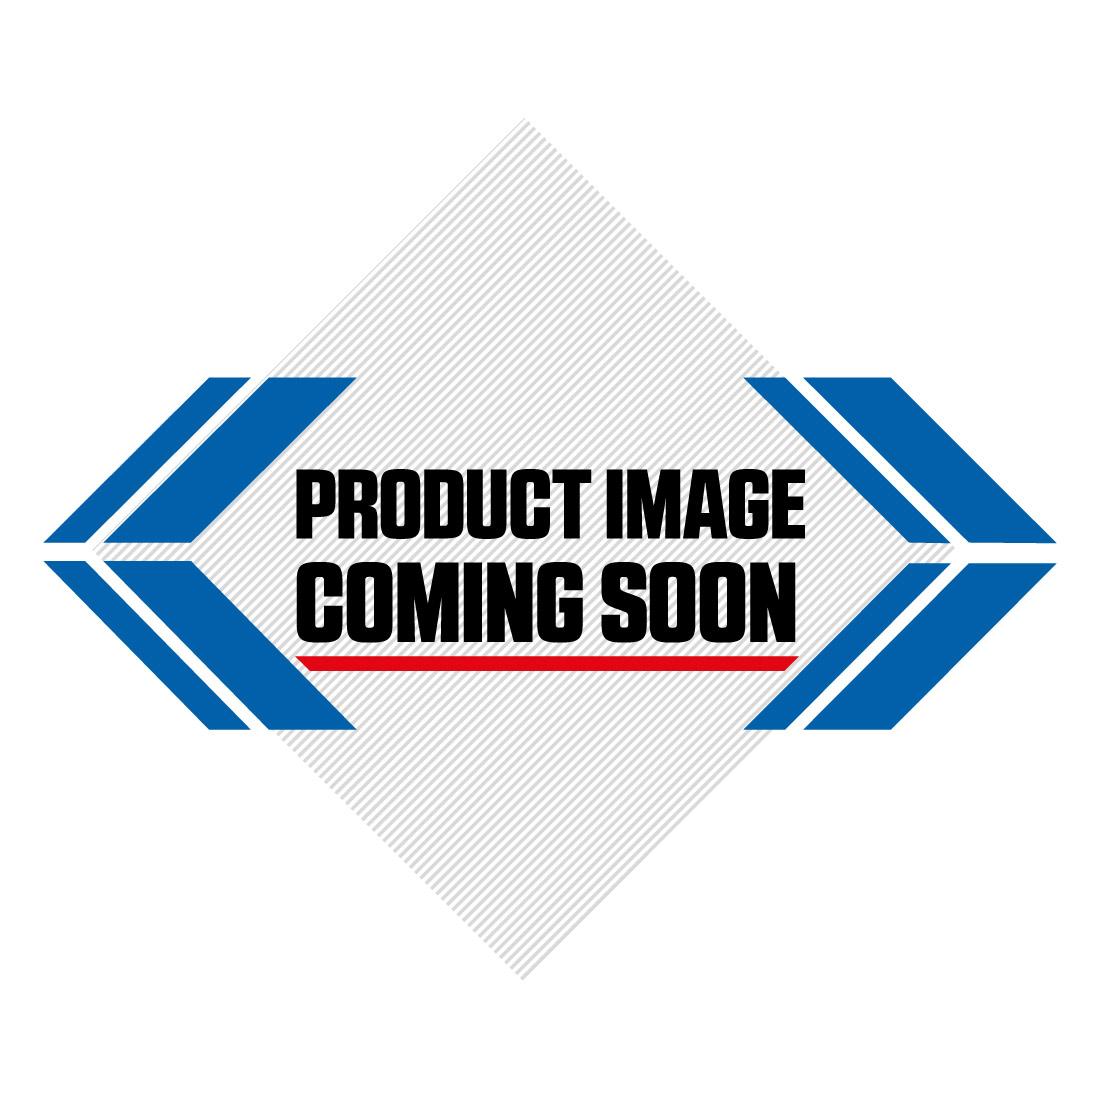 Silkolene Comp 4 10w-40 XP Ester Based Semi Synthetic Bike Engine Oil - 4 Cube Image-1